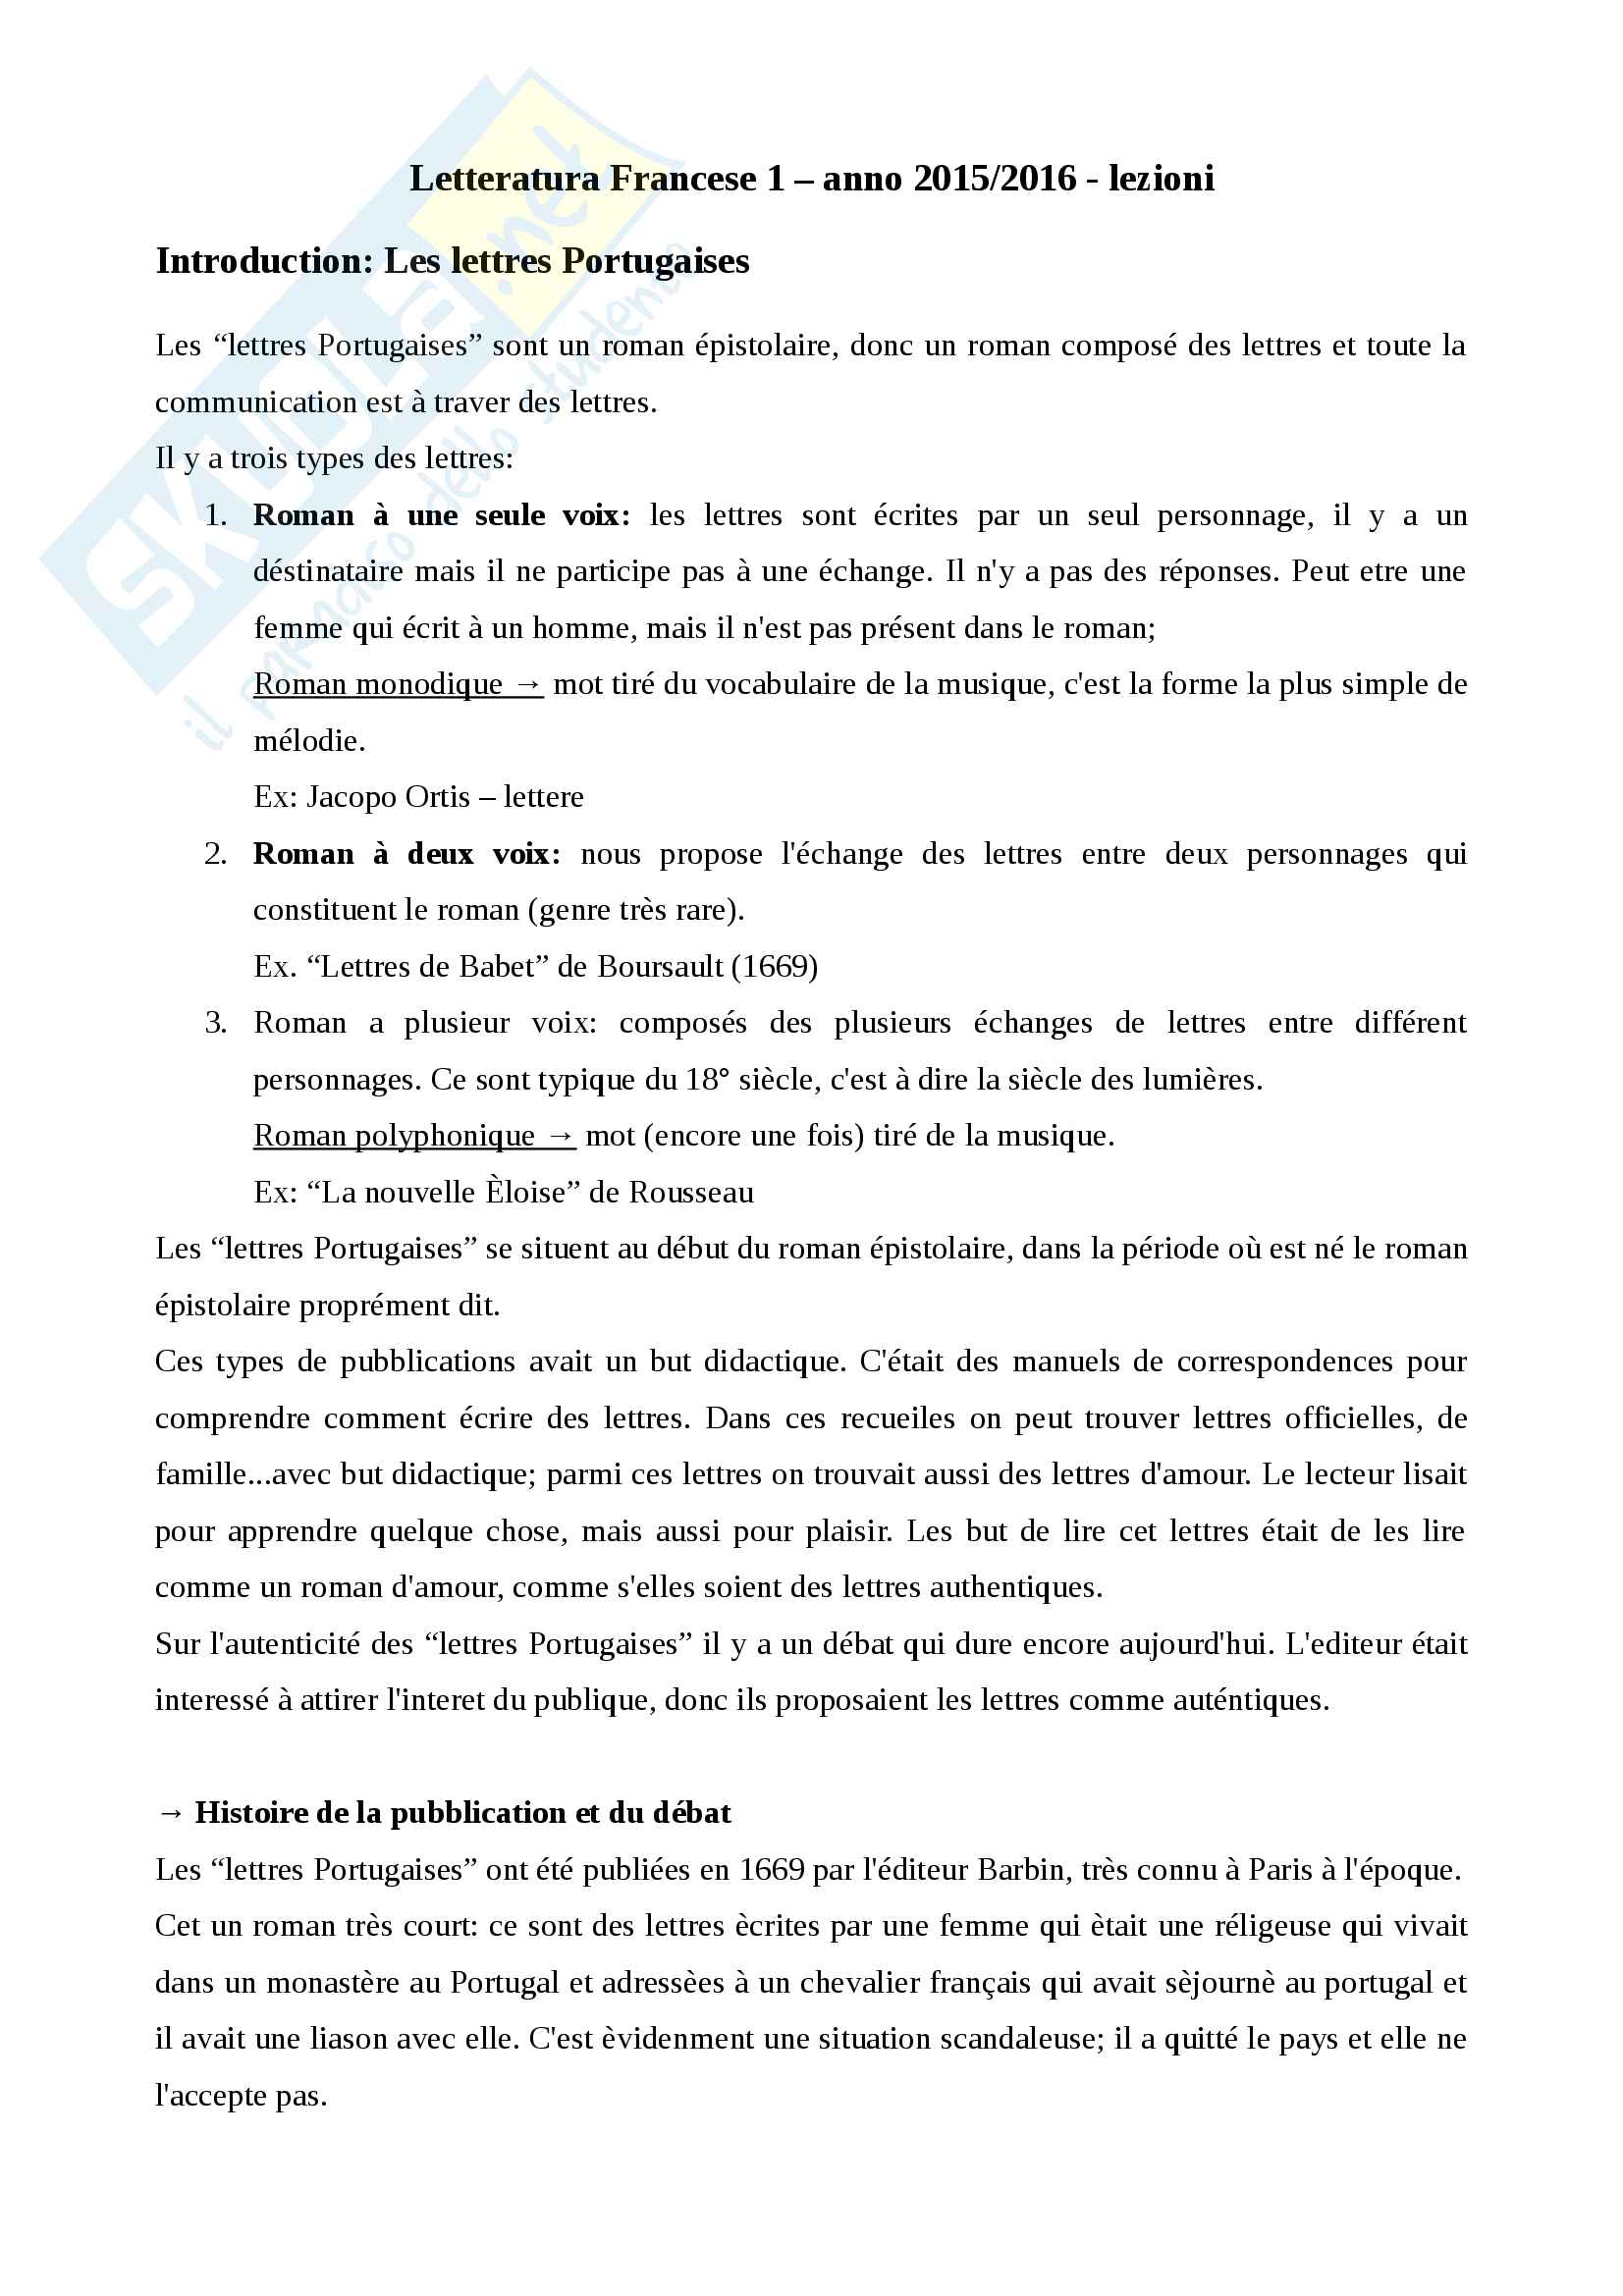 Appunti lezioni Guillerague - Marivaux